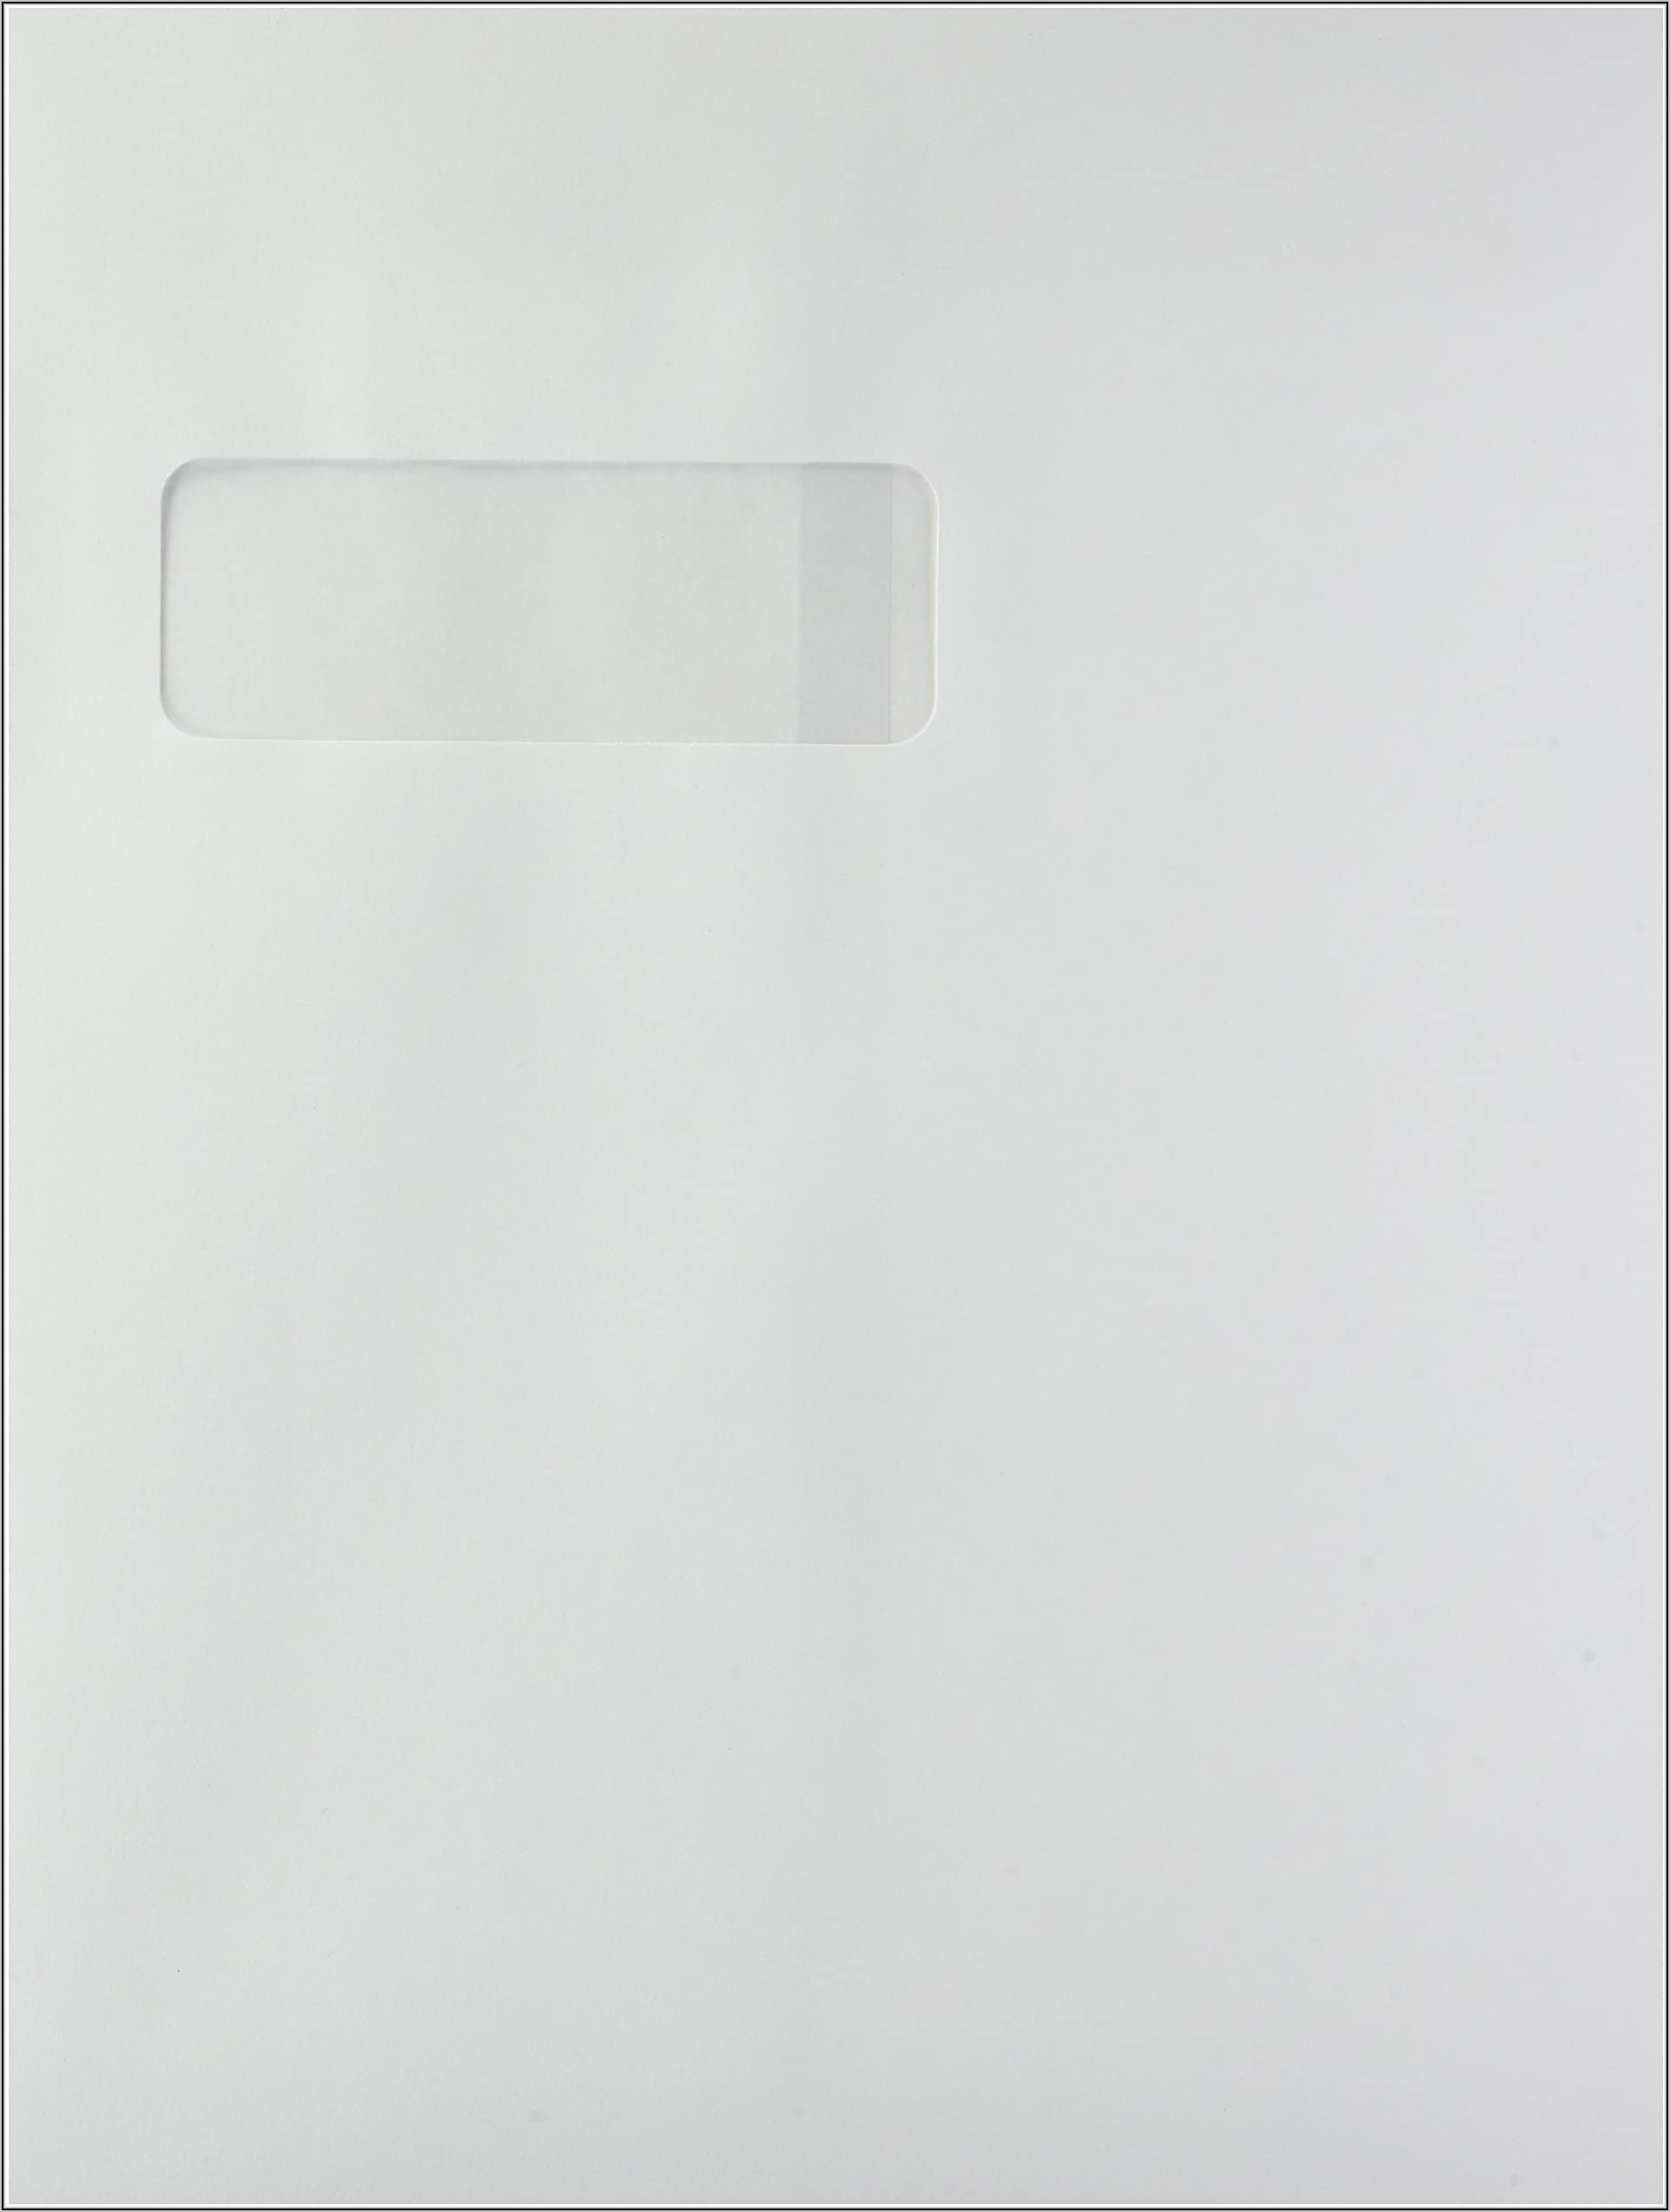 9 X 12 Open End Double Window Envelopes